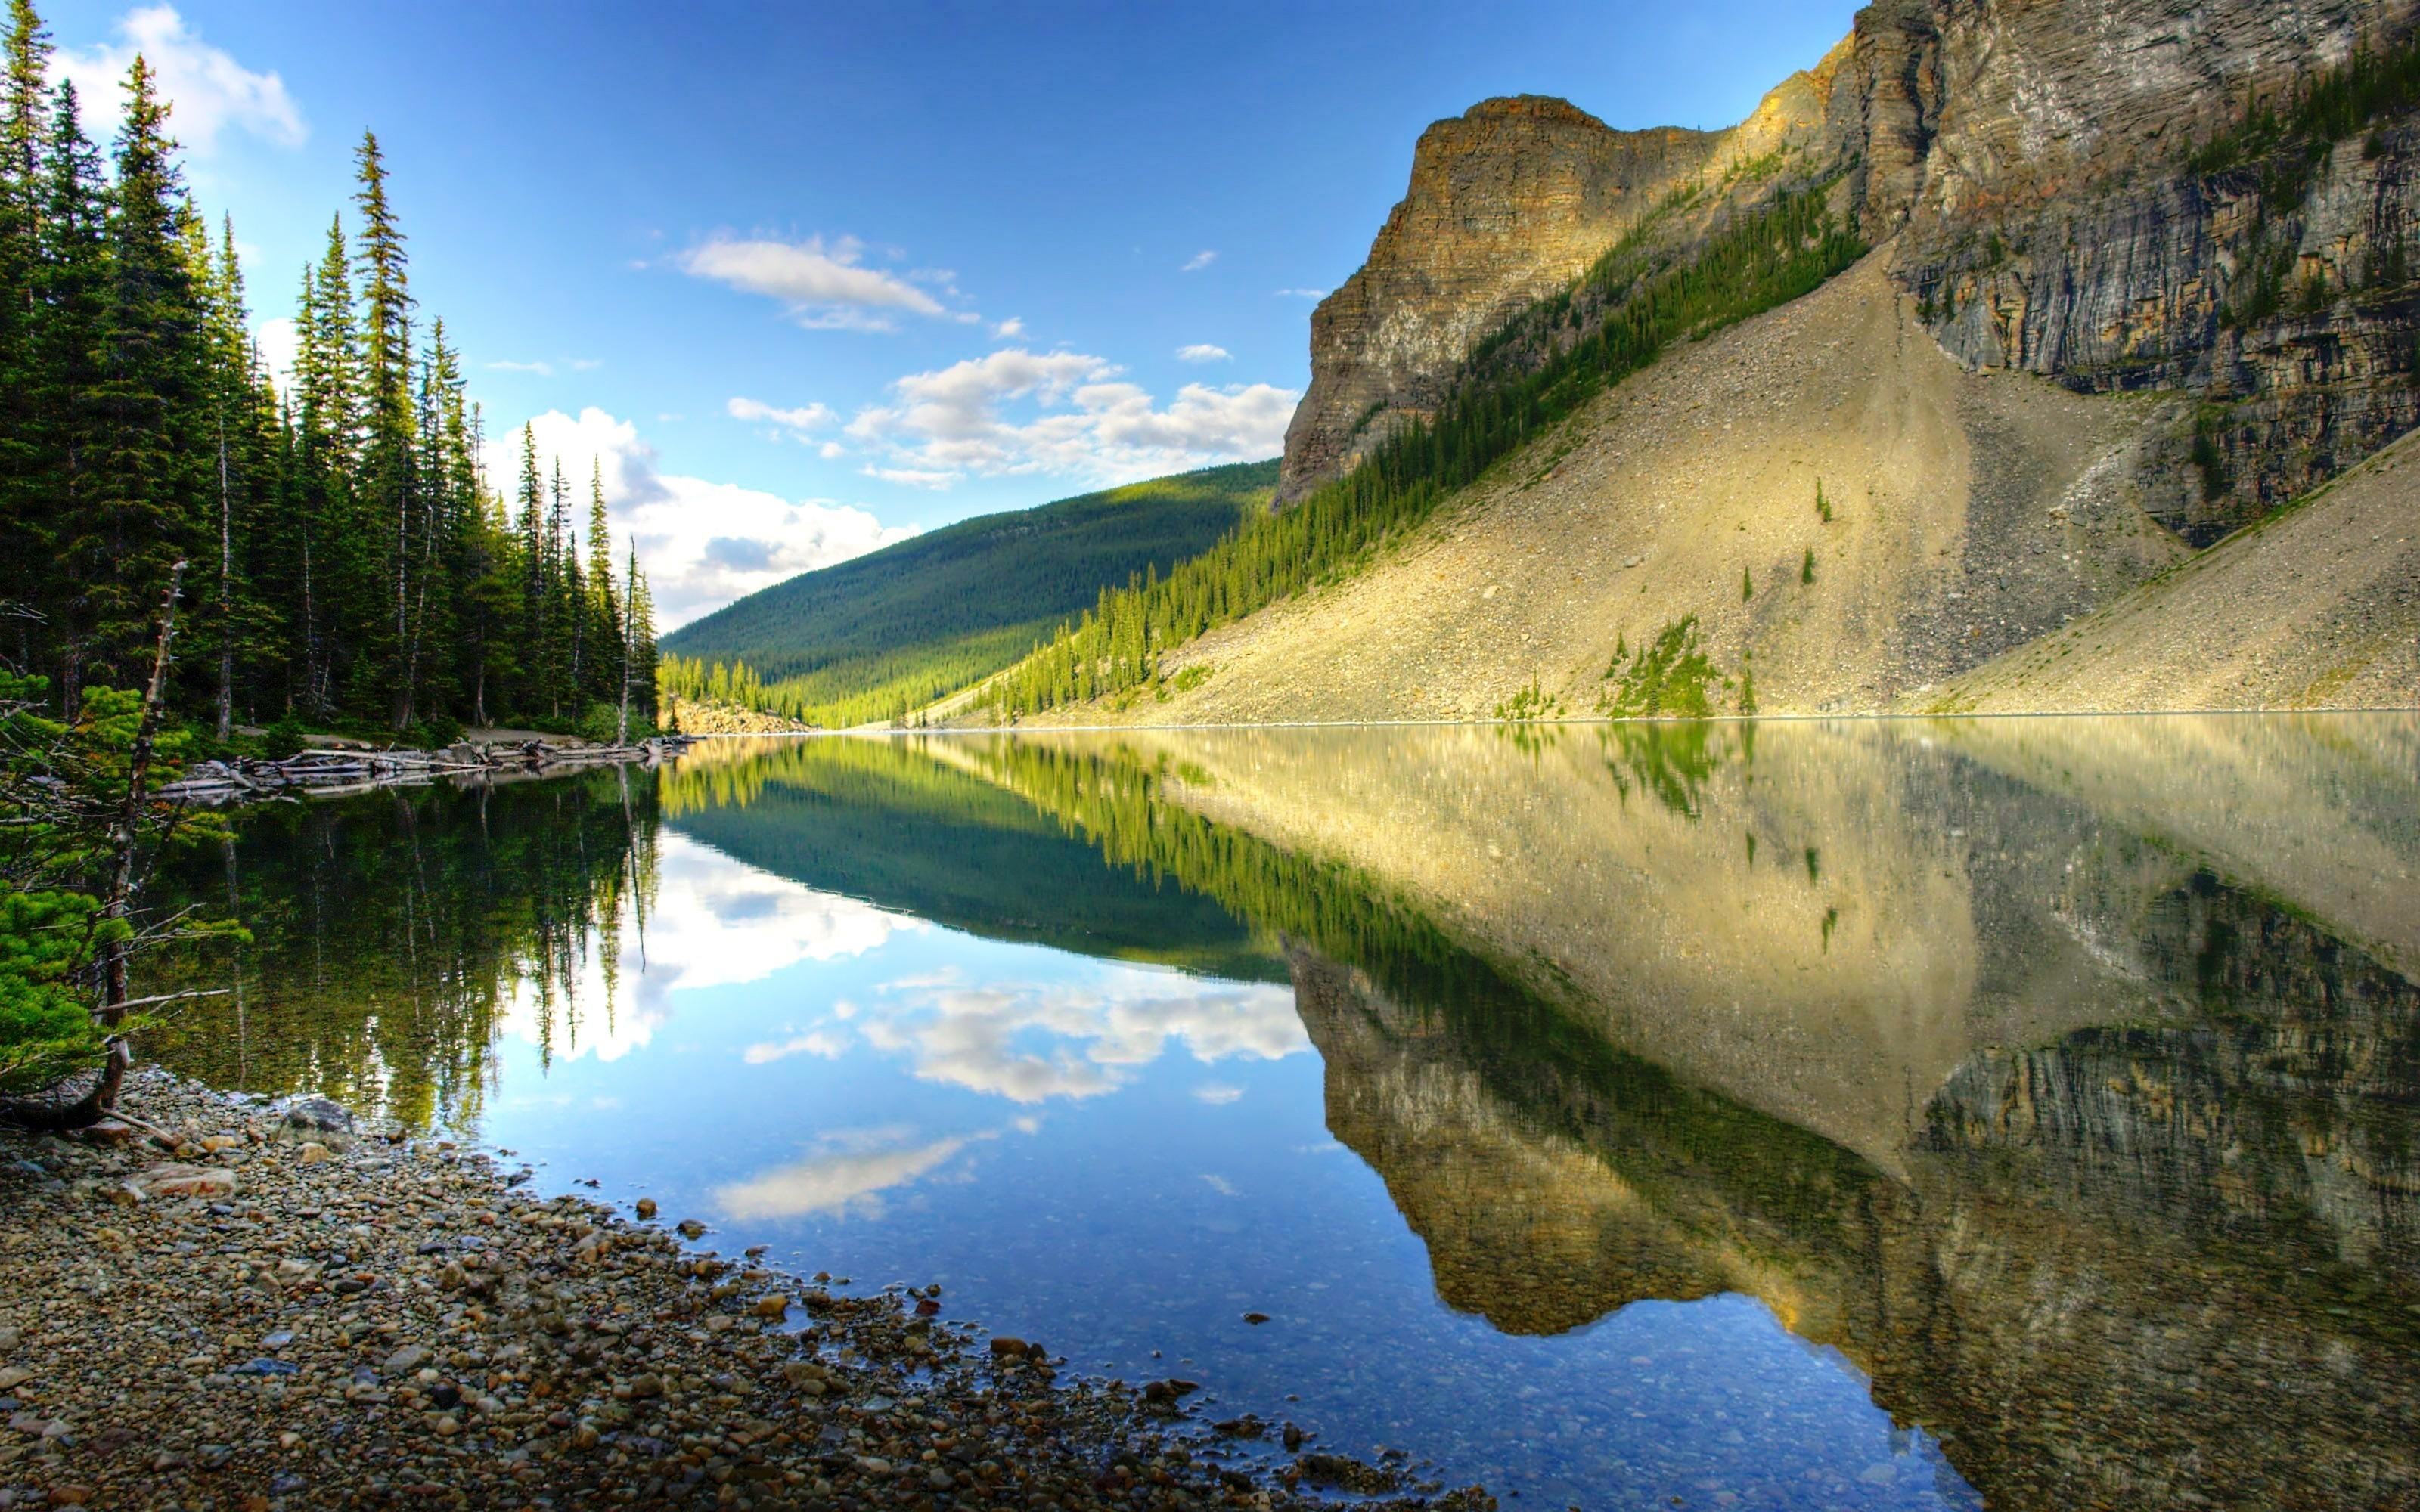 40 Scenic Lake Wallpaper for your Desktop   Naldz Graphics